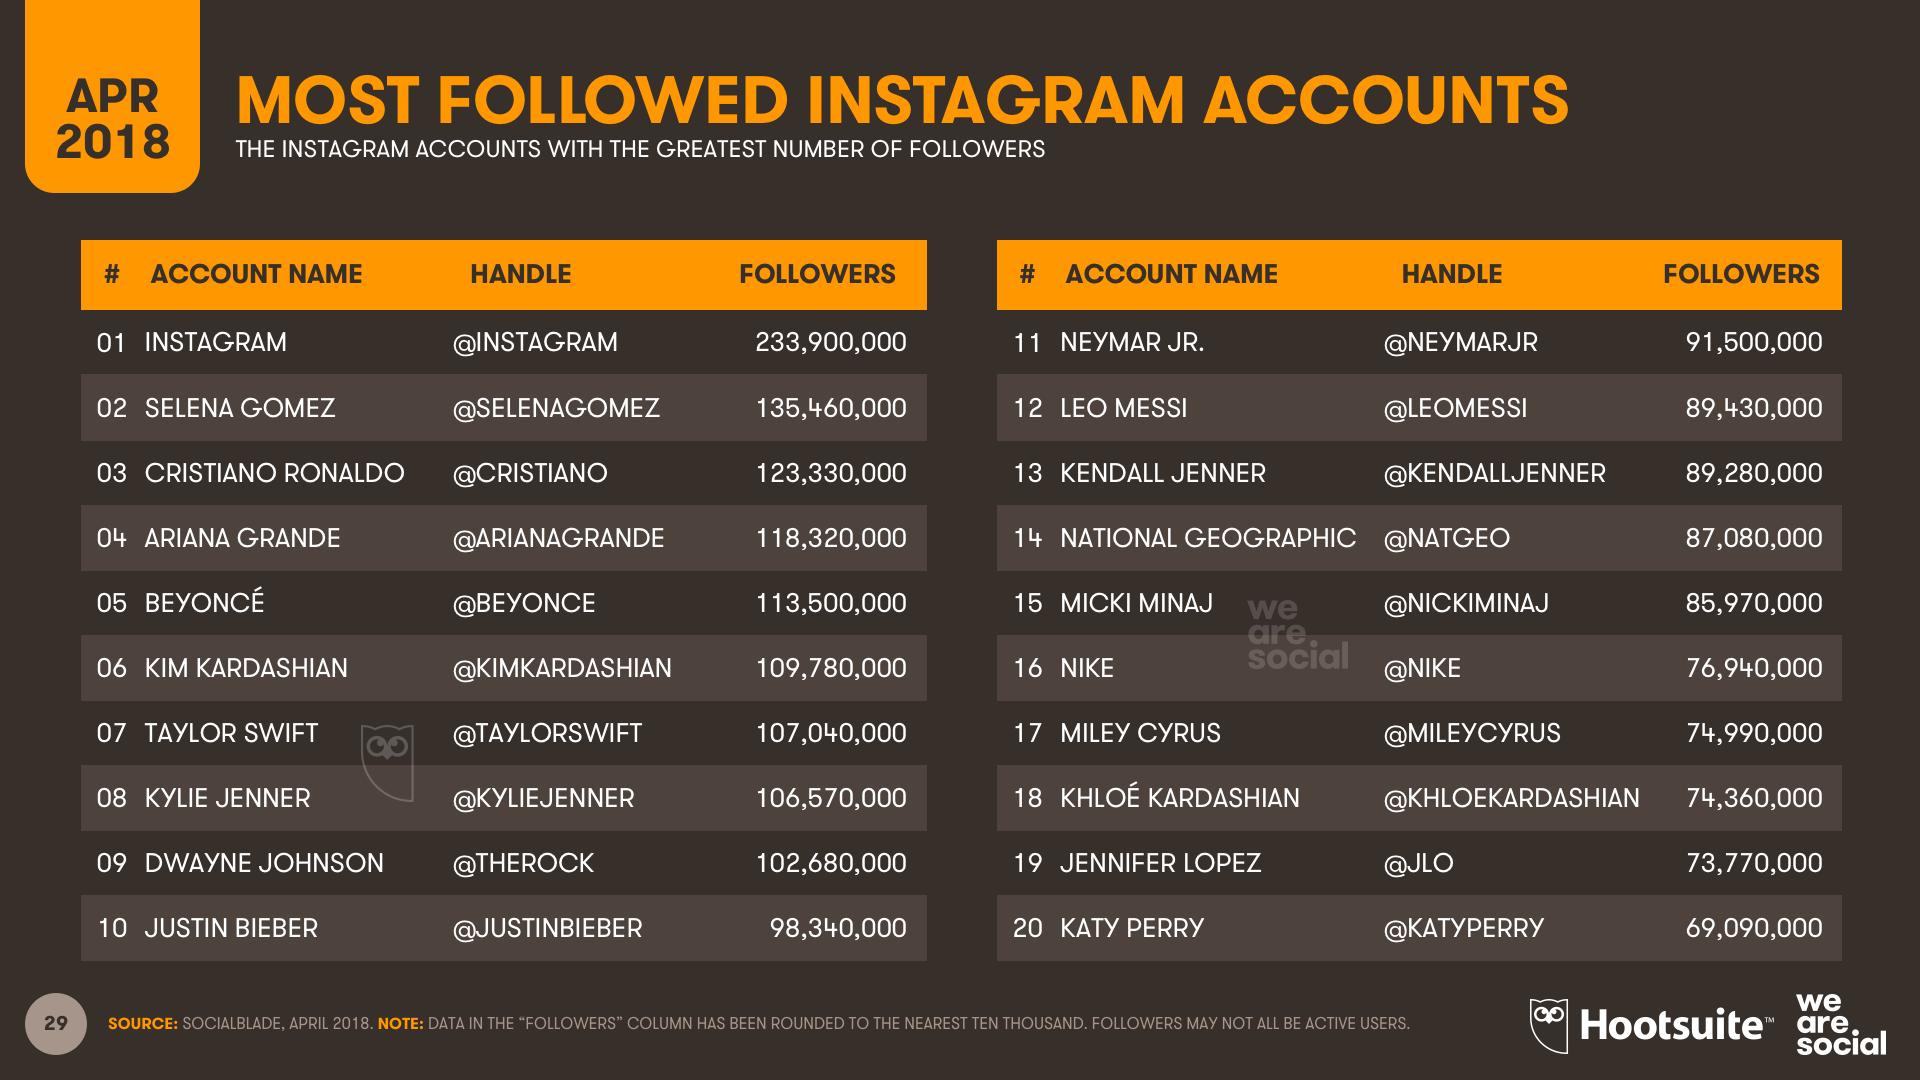 Instagram Most Followed - Q1 2018